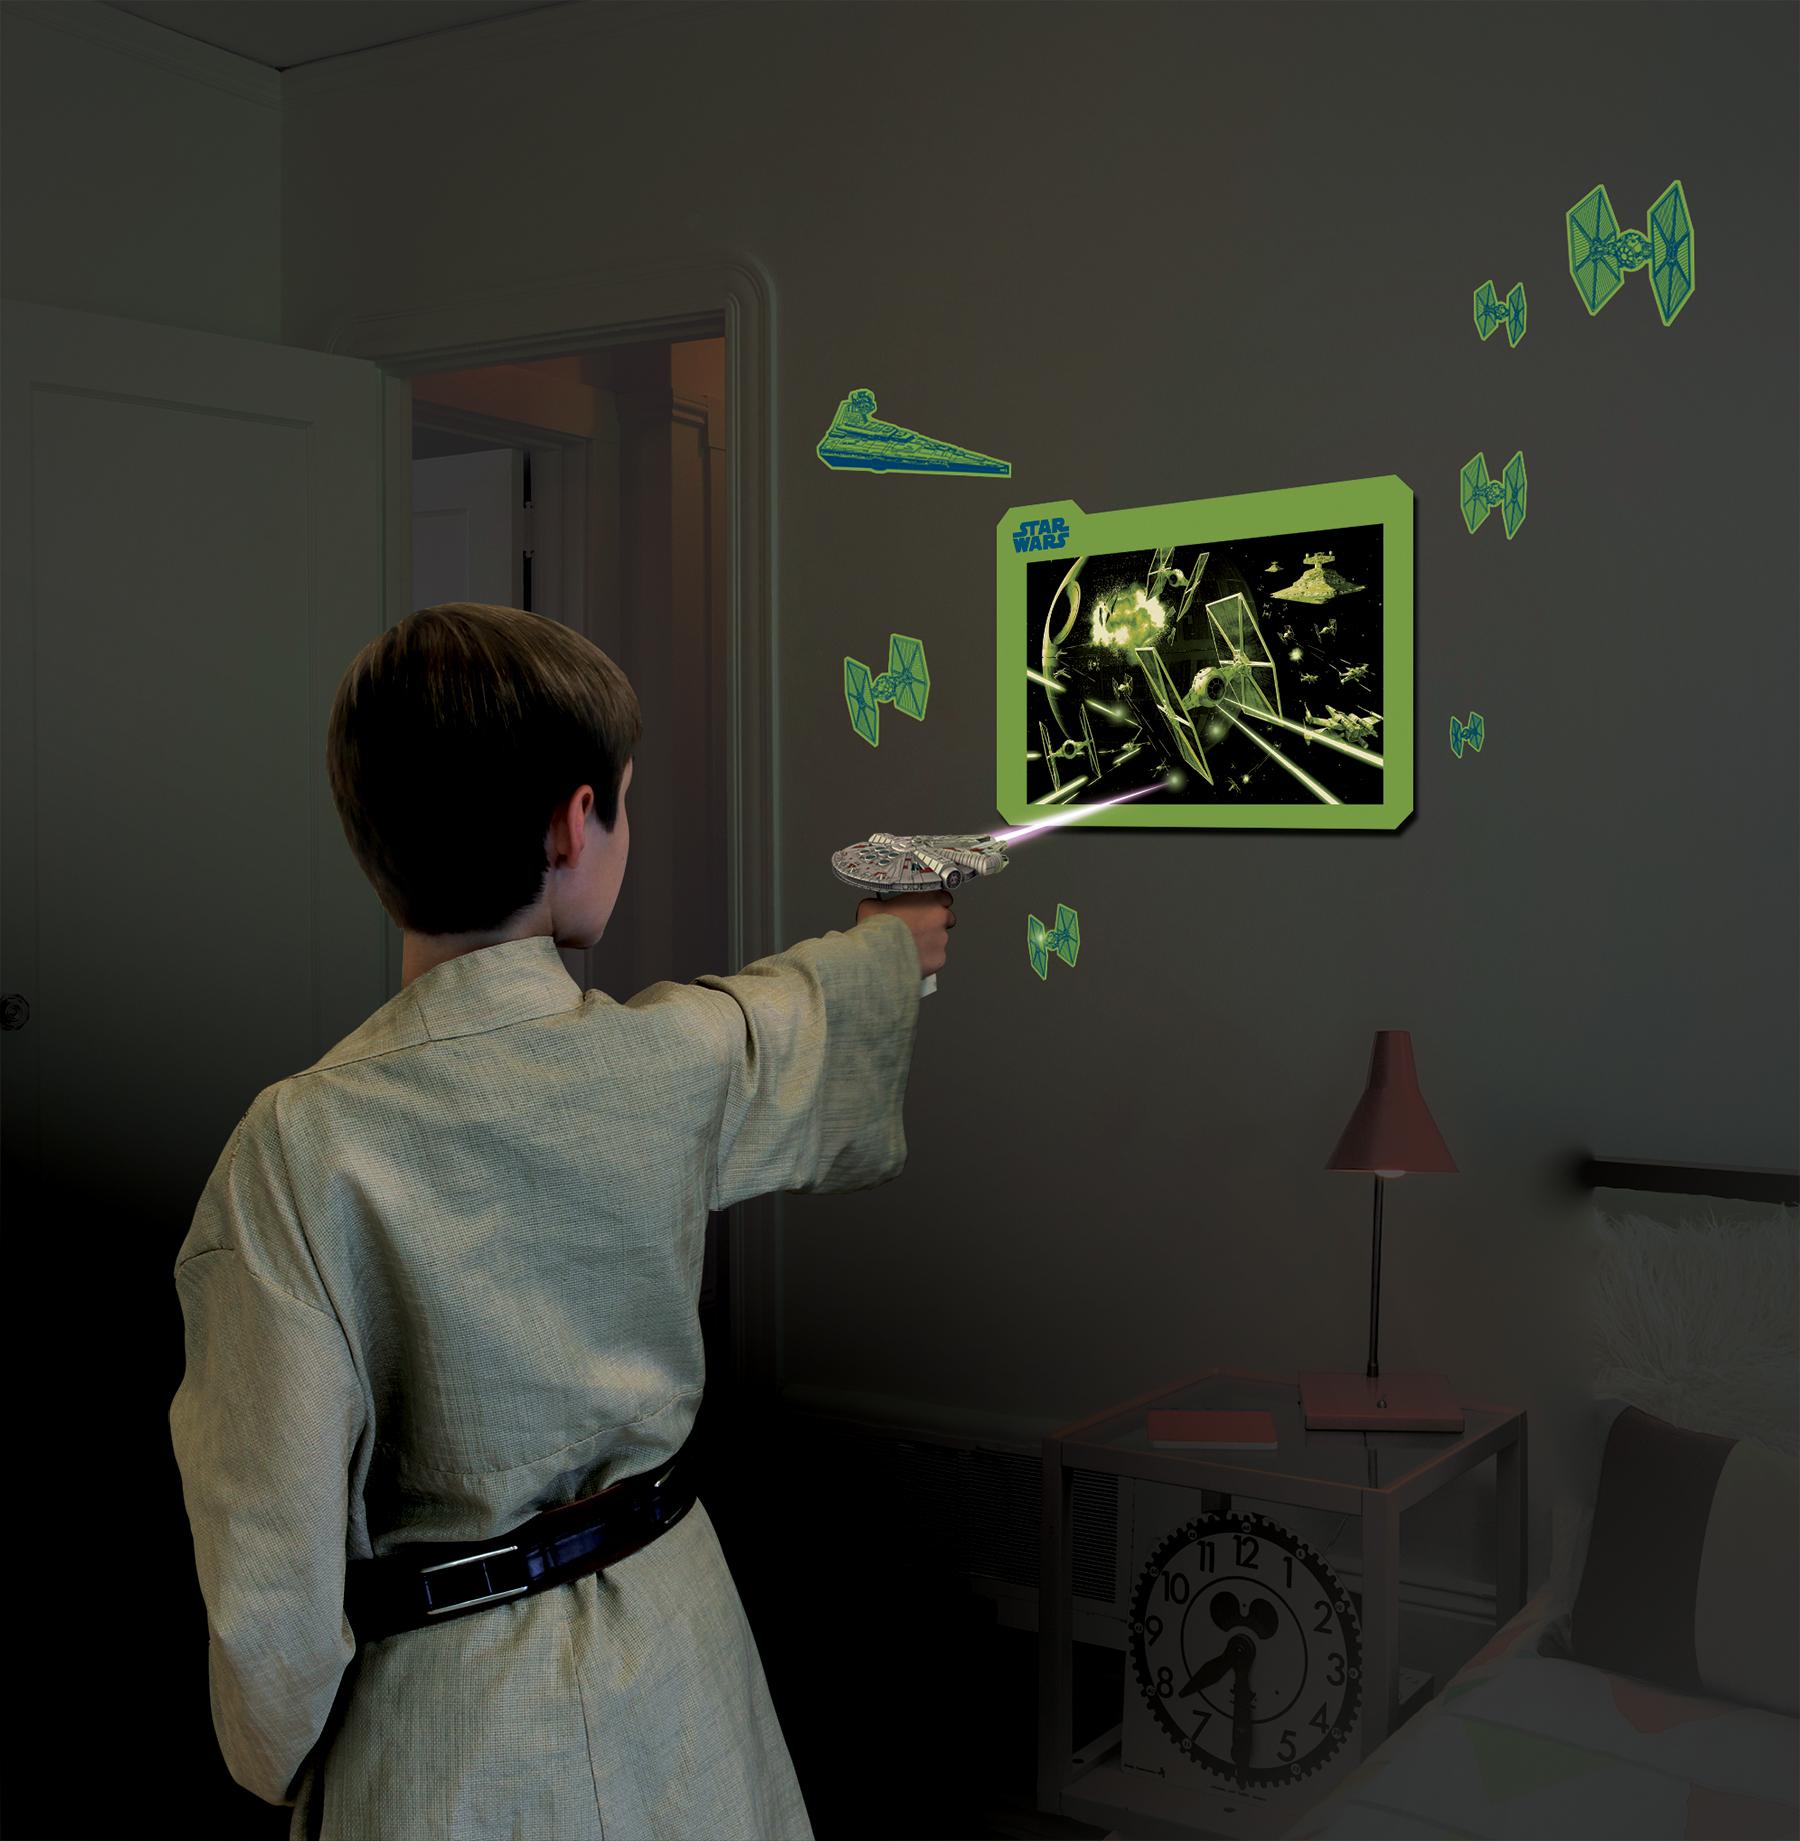 star wars lightsaber crystal growing lab instructions